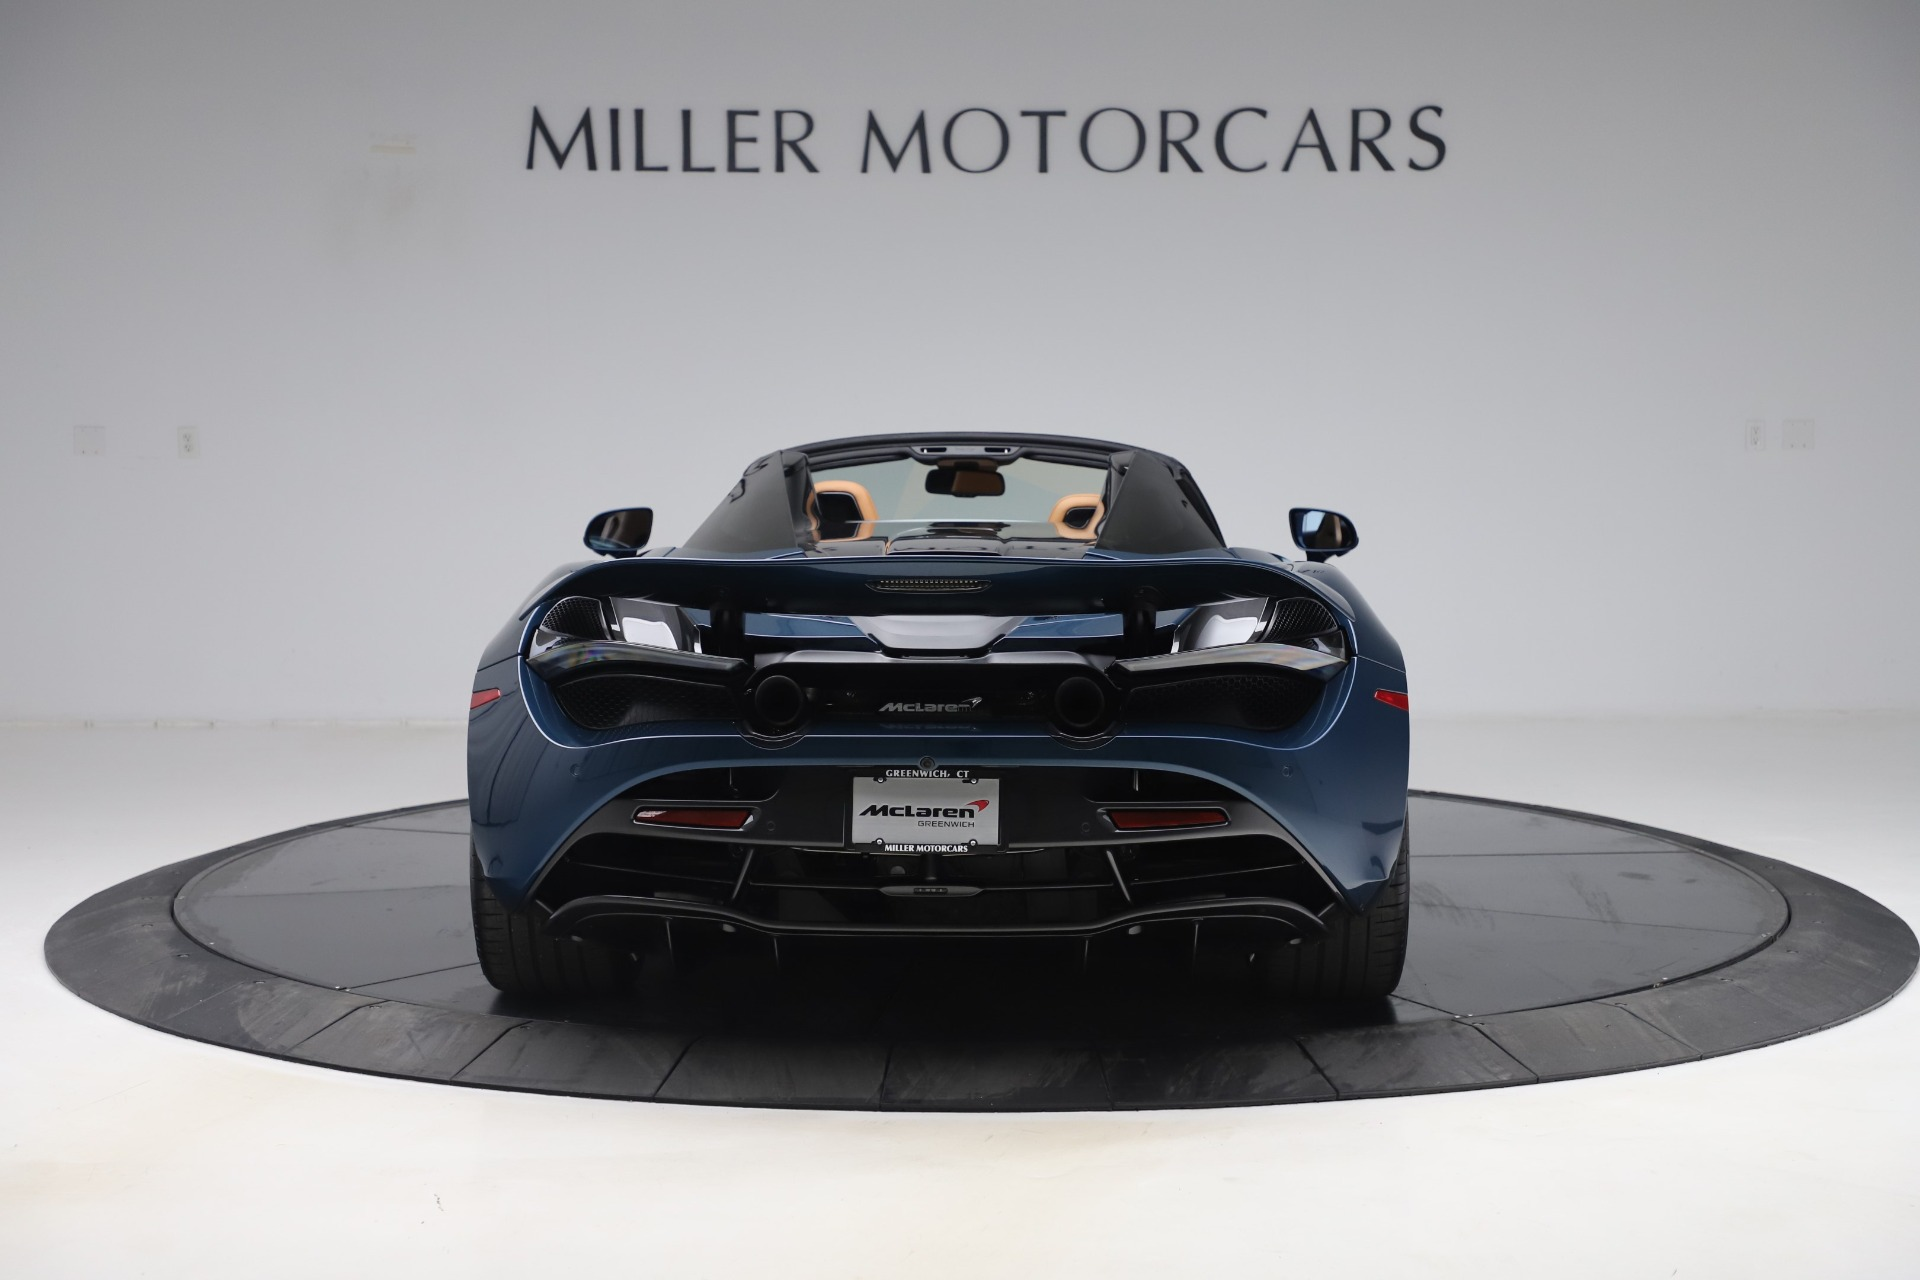 New-2020-McLaren-720S-Spider-Luxury